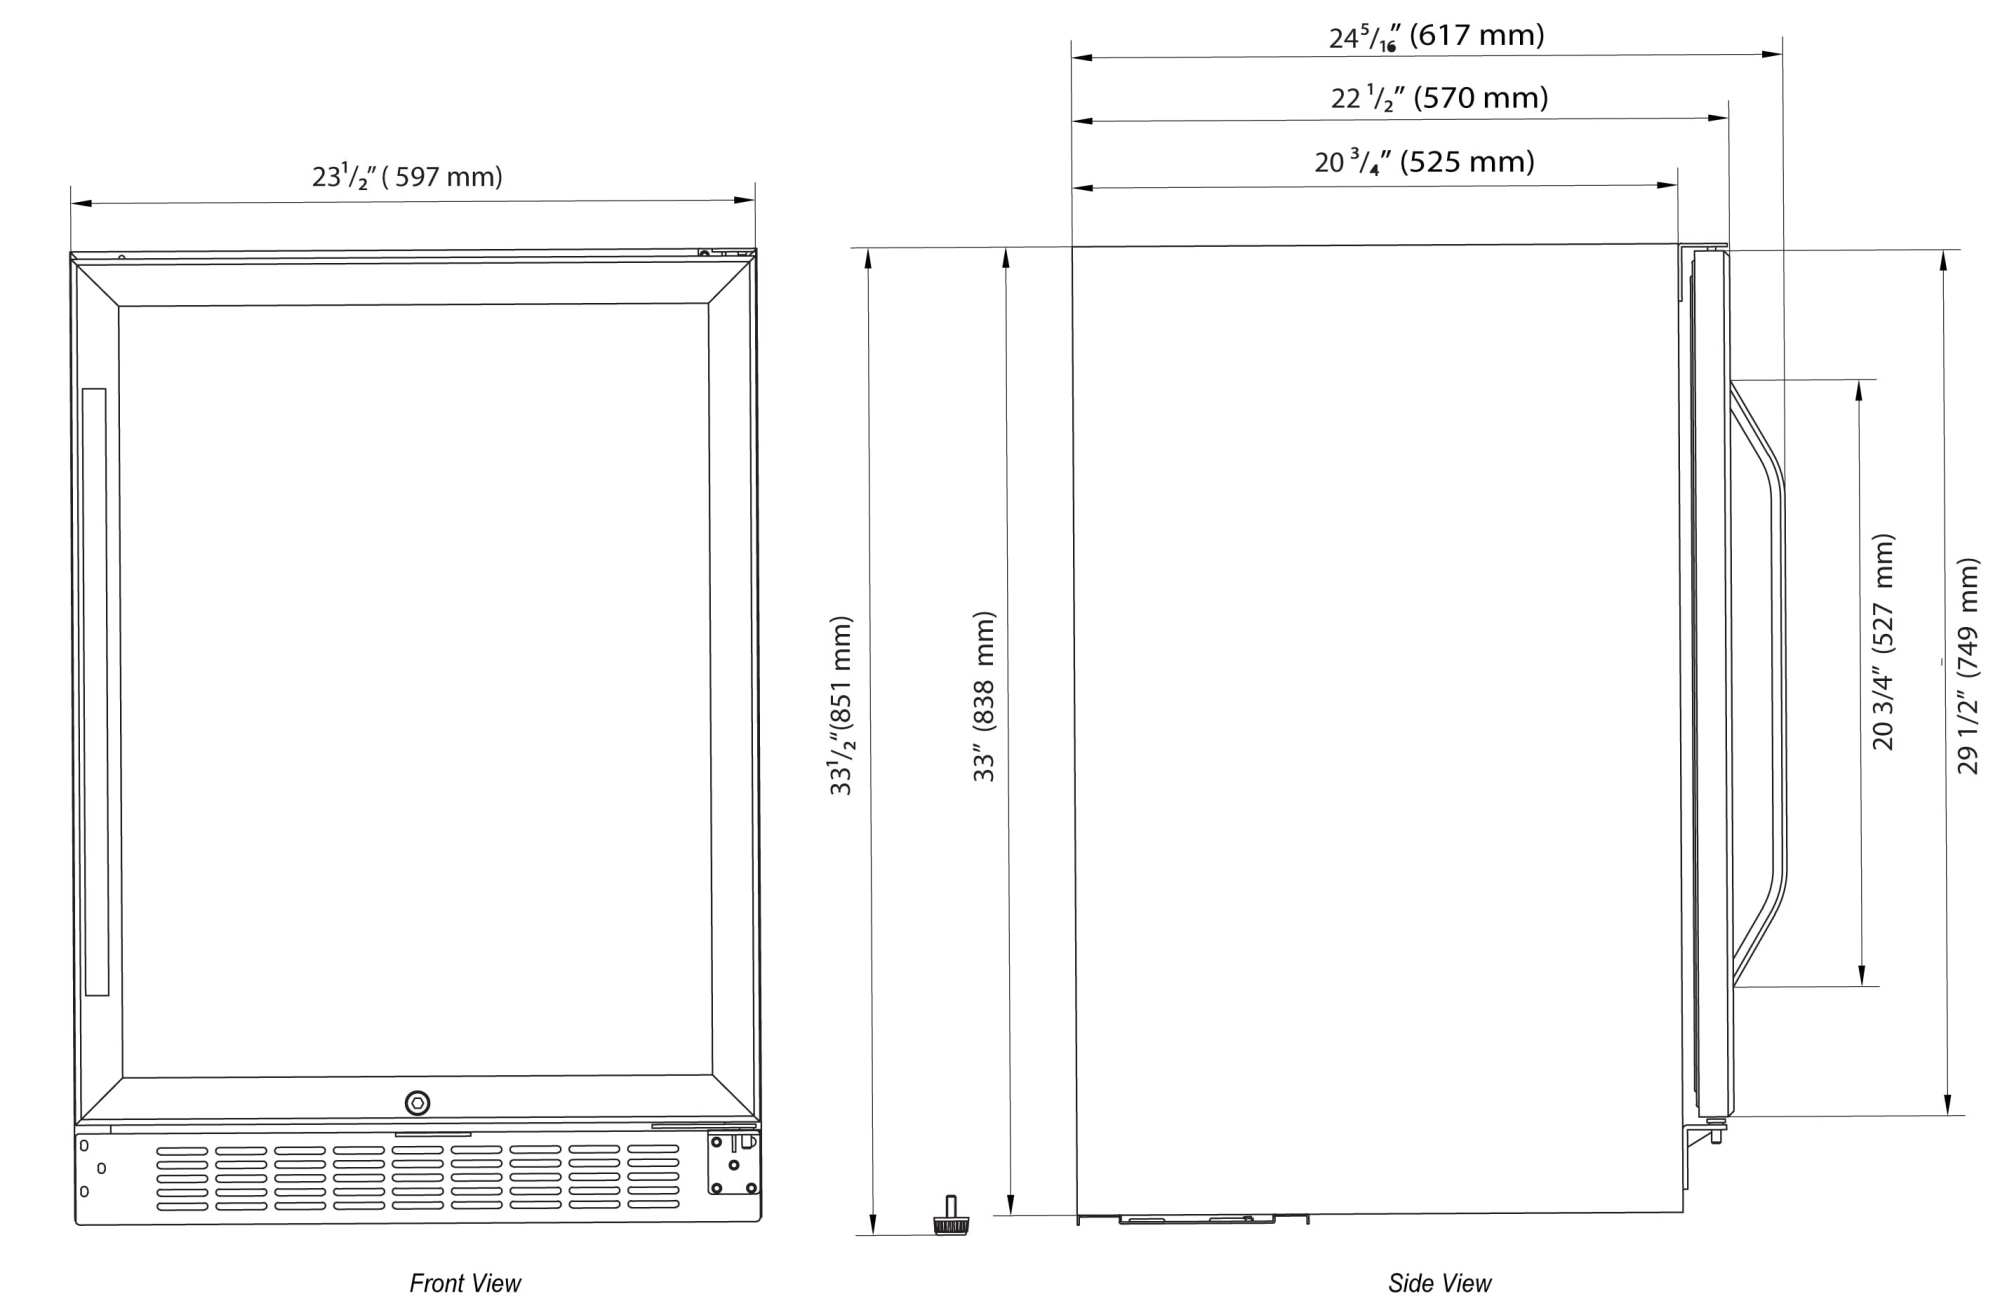 hight resolution of edgestar wiring diagram wiring diagram post edgestar wiring diagram